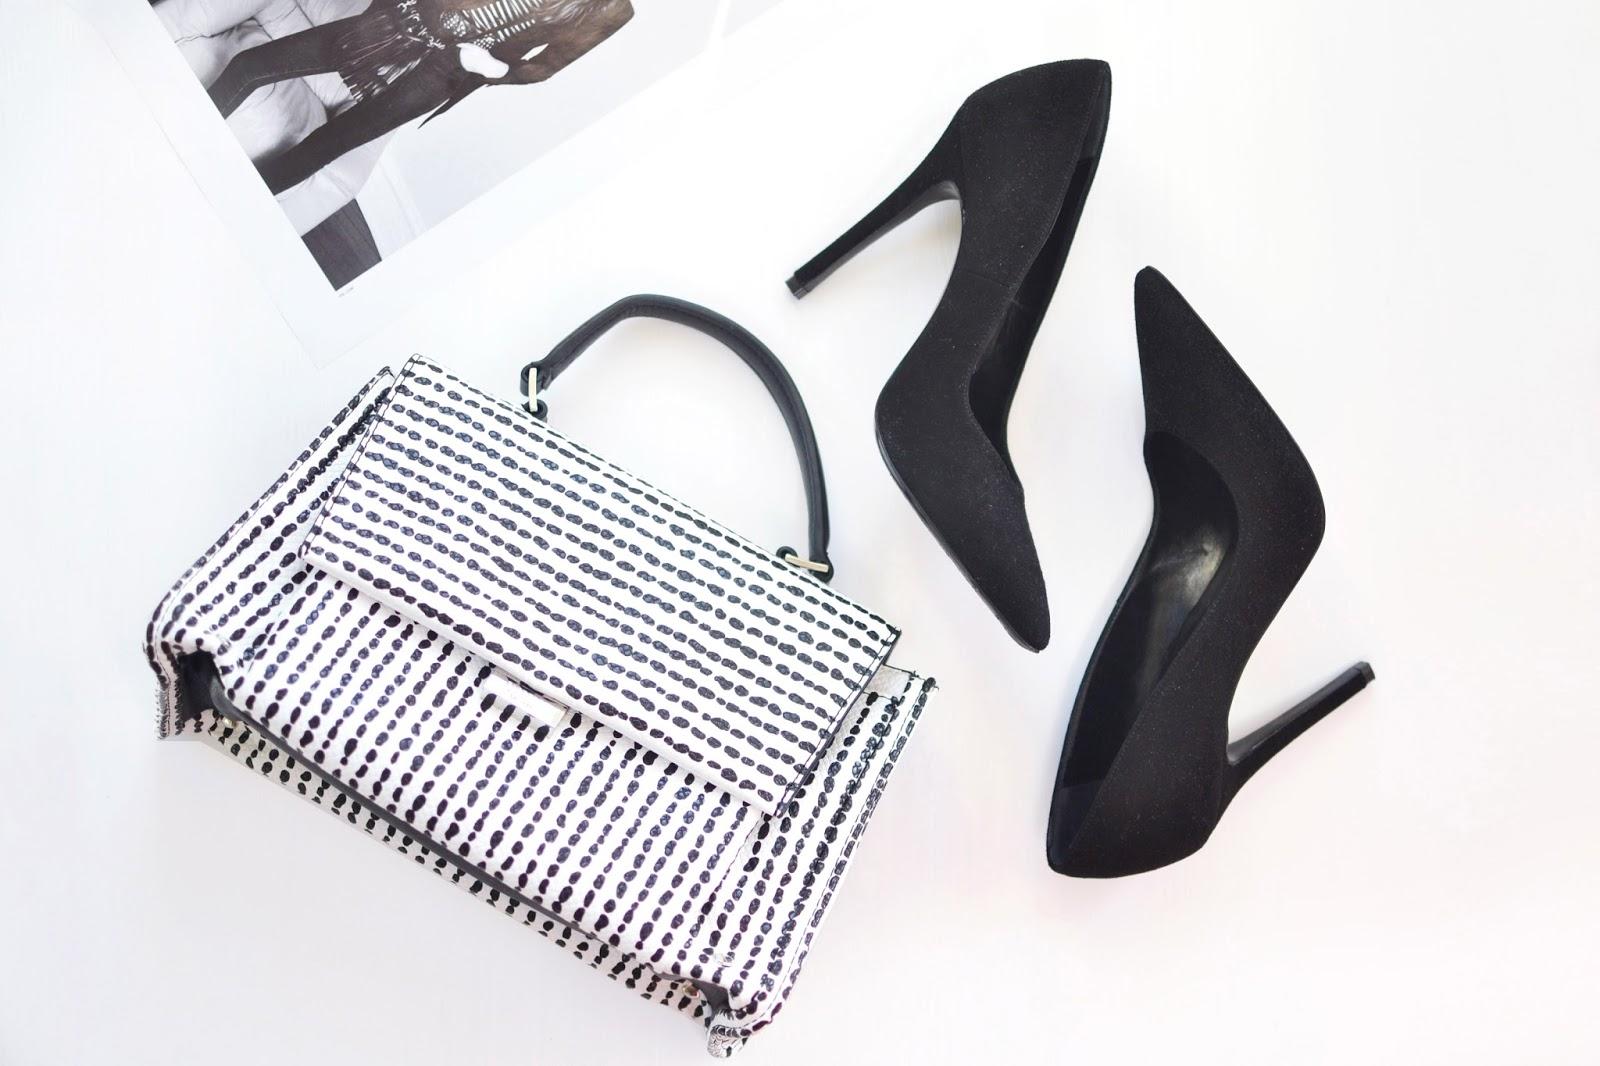 monochrome accessories, fiorelli bags, black court shoes